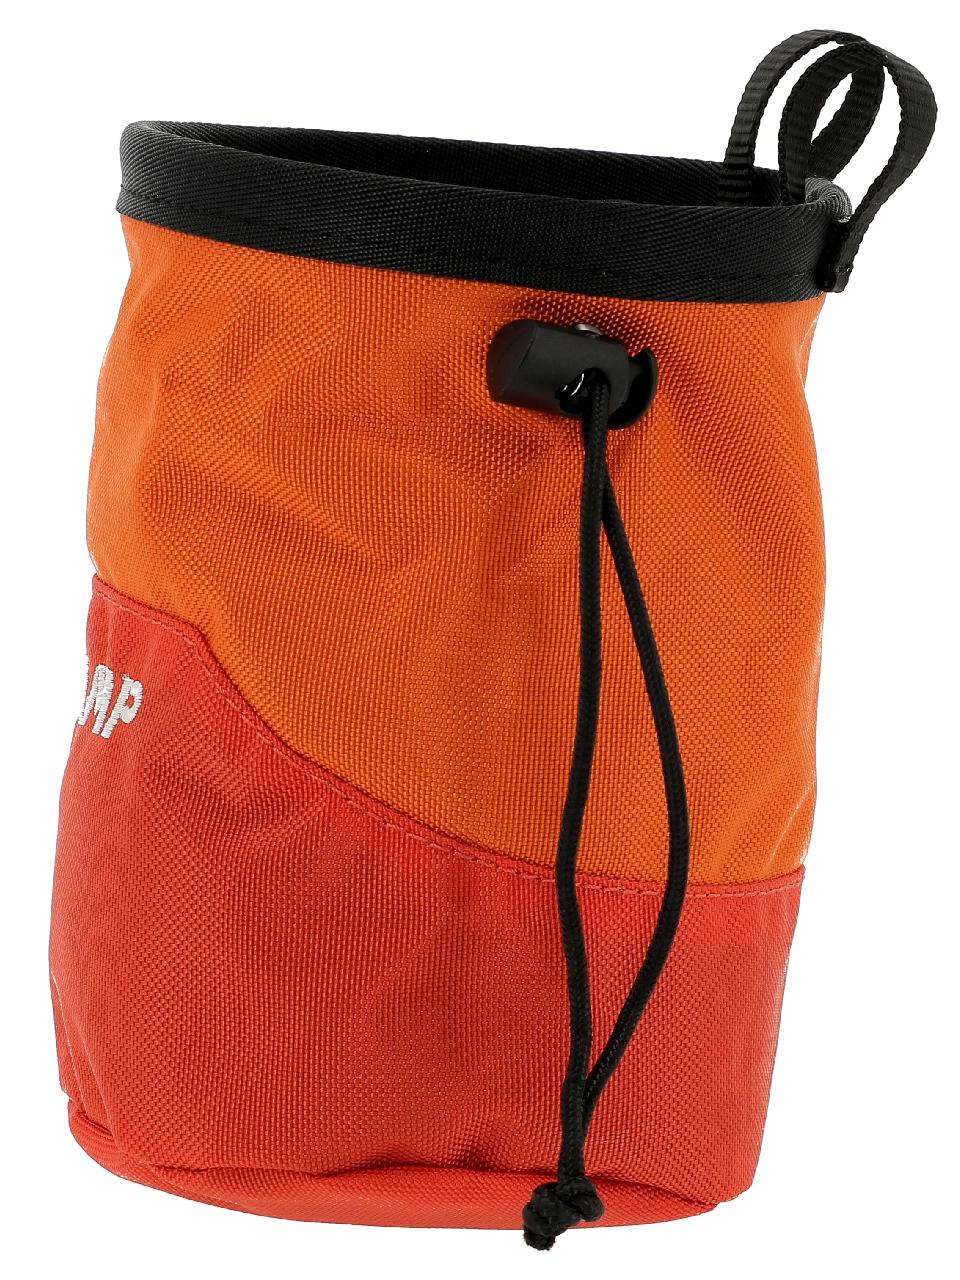 Sac-a-pof-Camp-Acqualong-org-sac-pof-Orange-15010-Neuf miniature 2